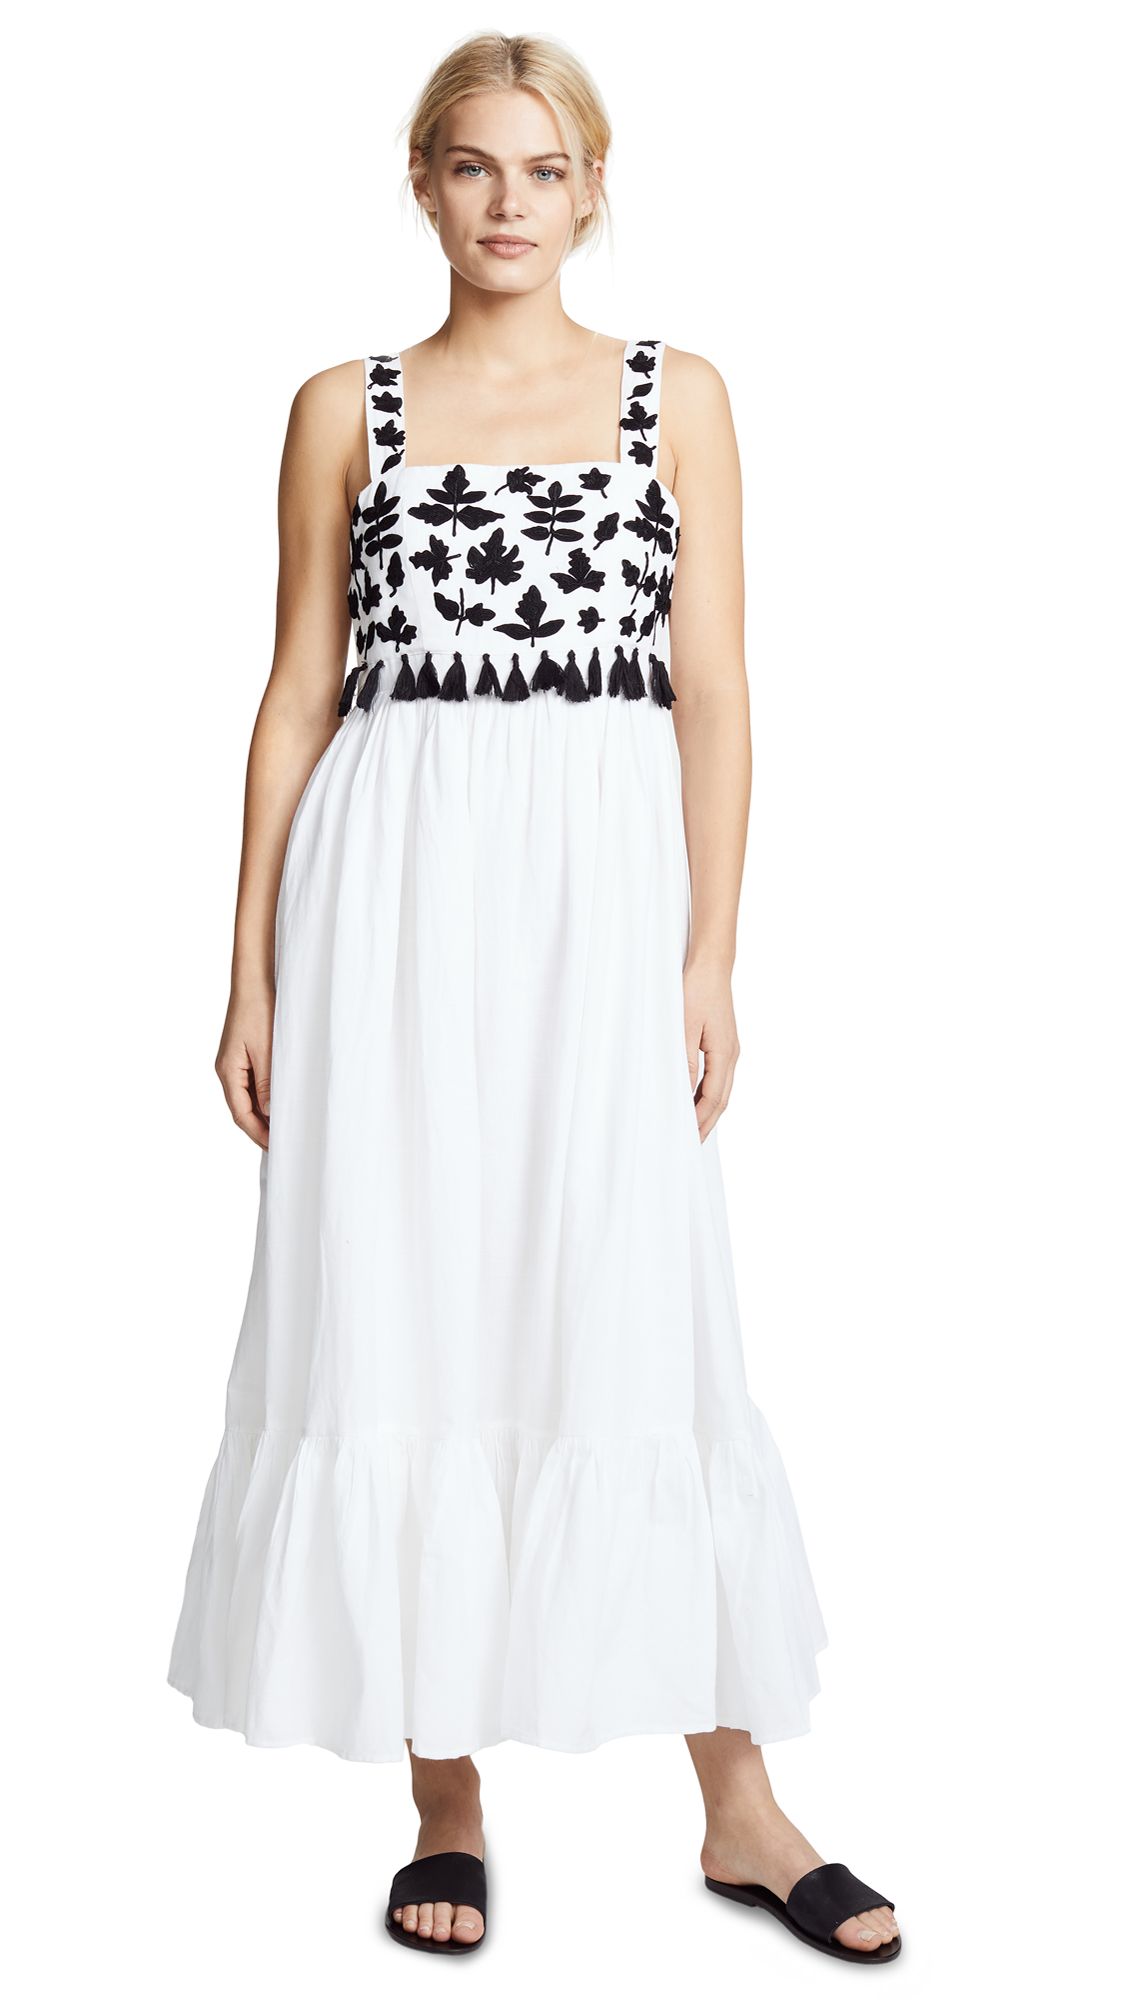 Carolina K Terry Embroidered Dress